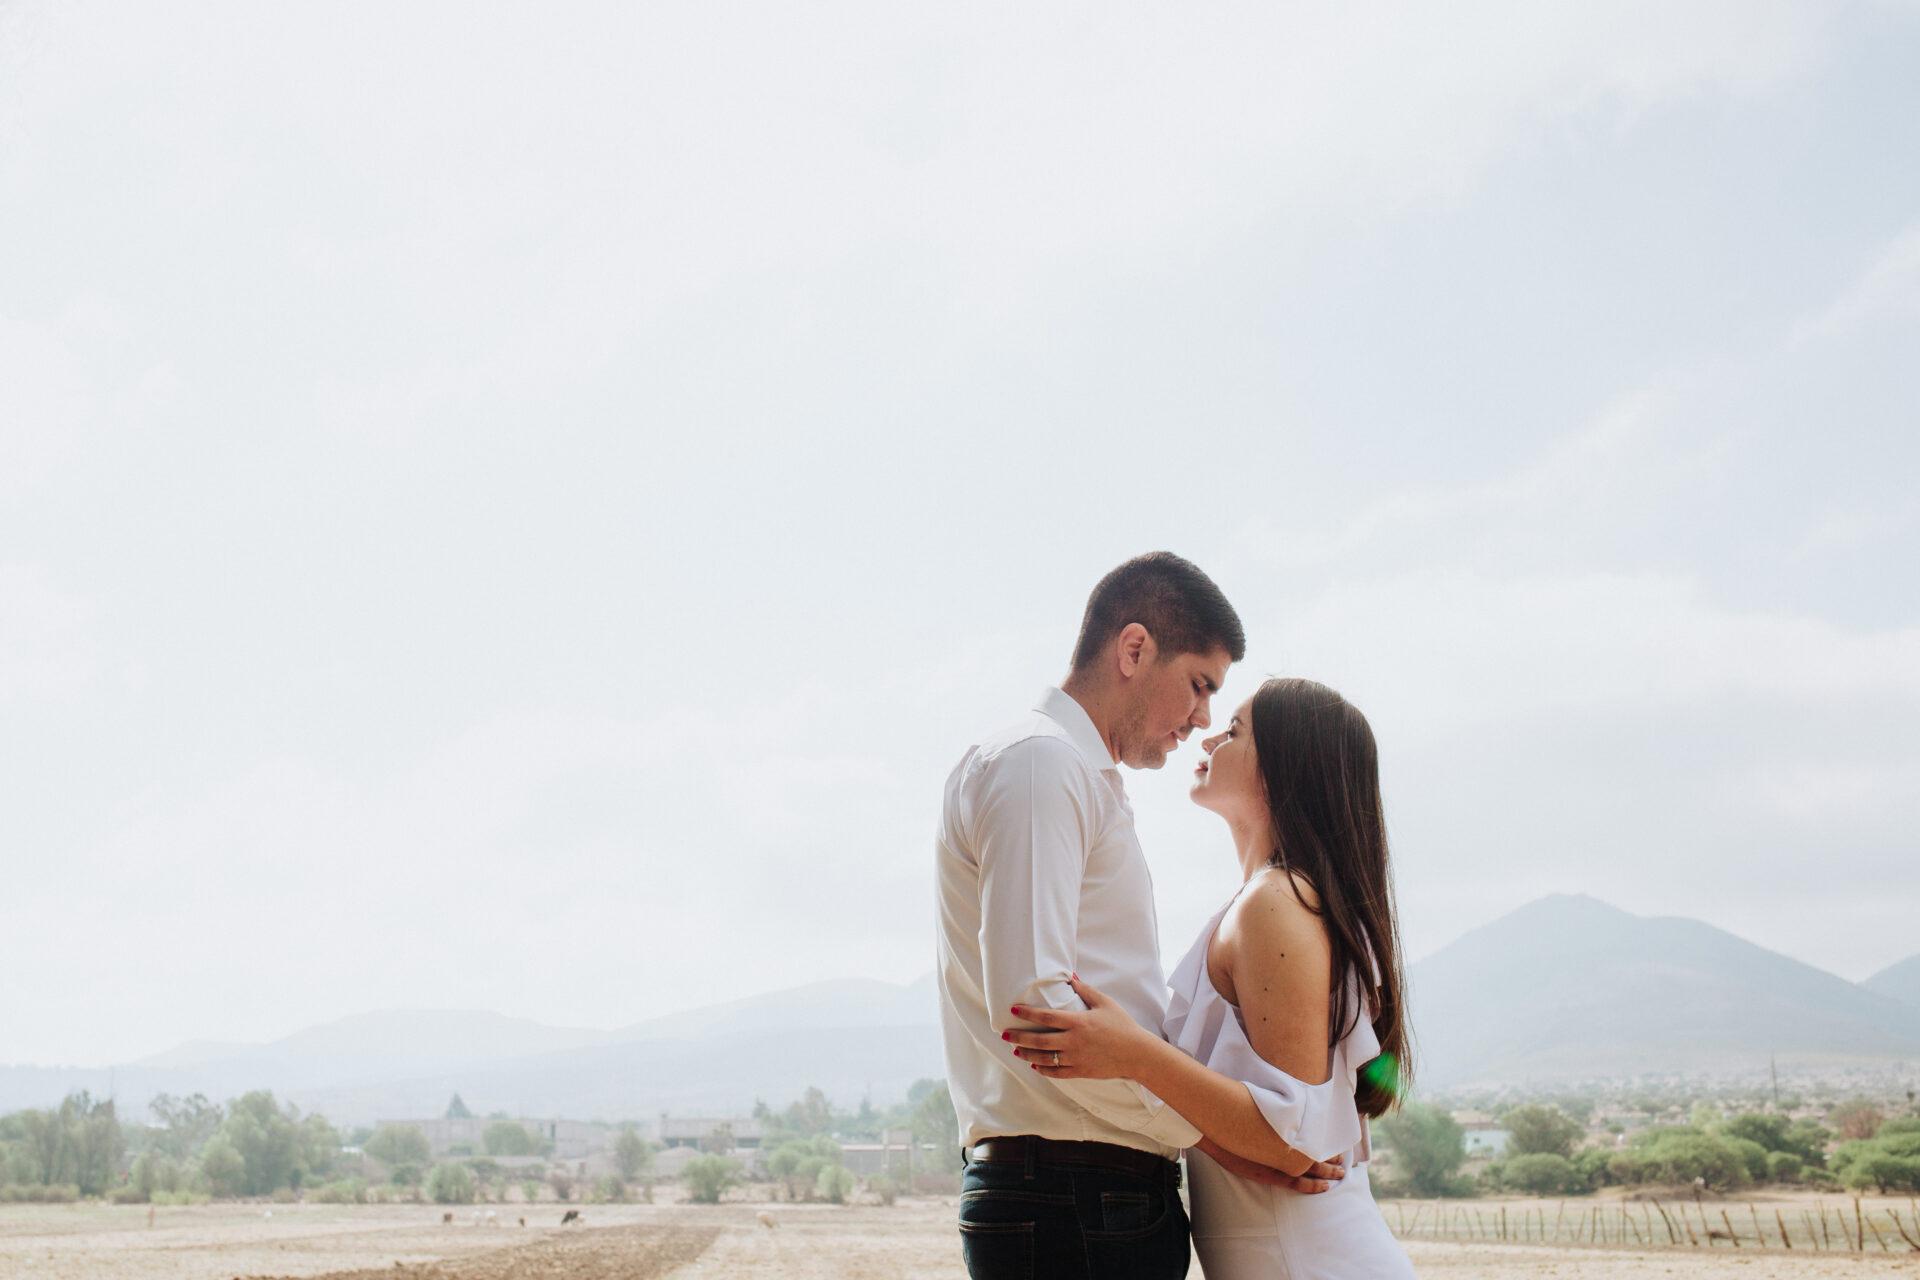 javier_noriega_fotografo_bodas_save_the_date_preboda_zacatecas_wedding_photographer16